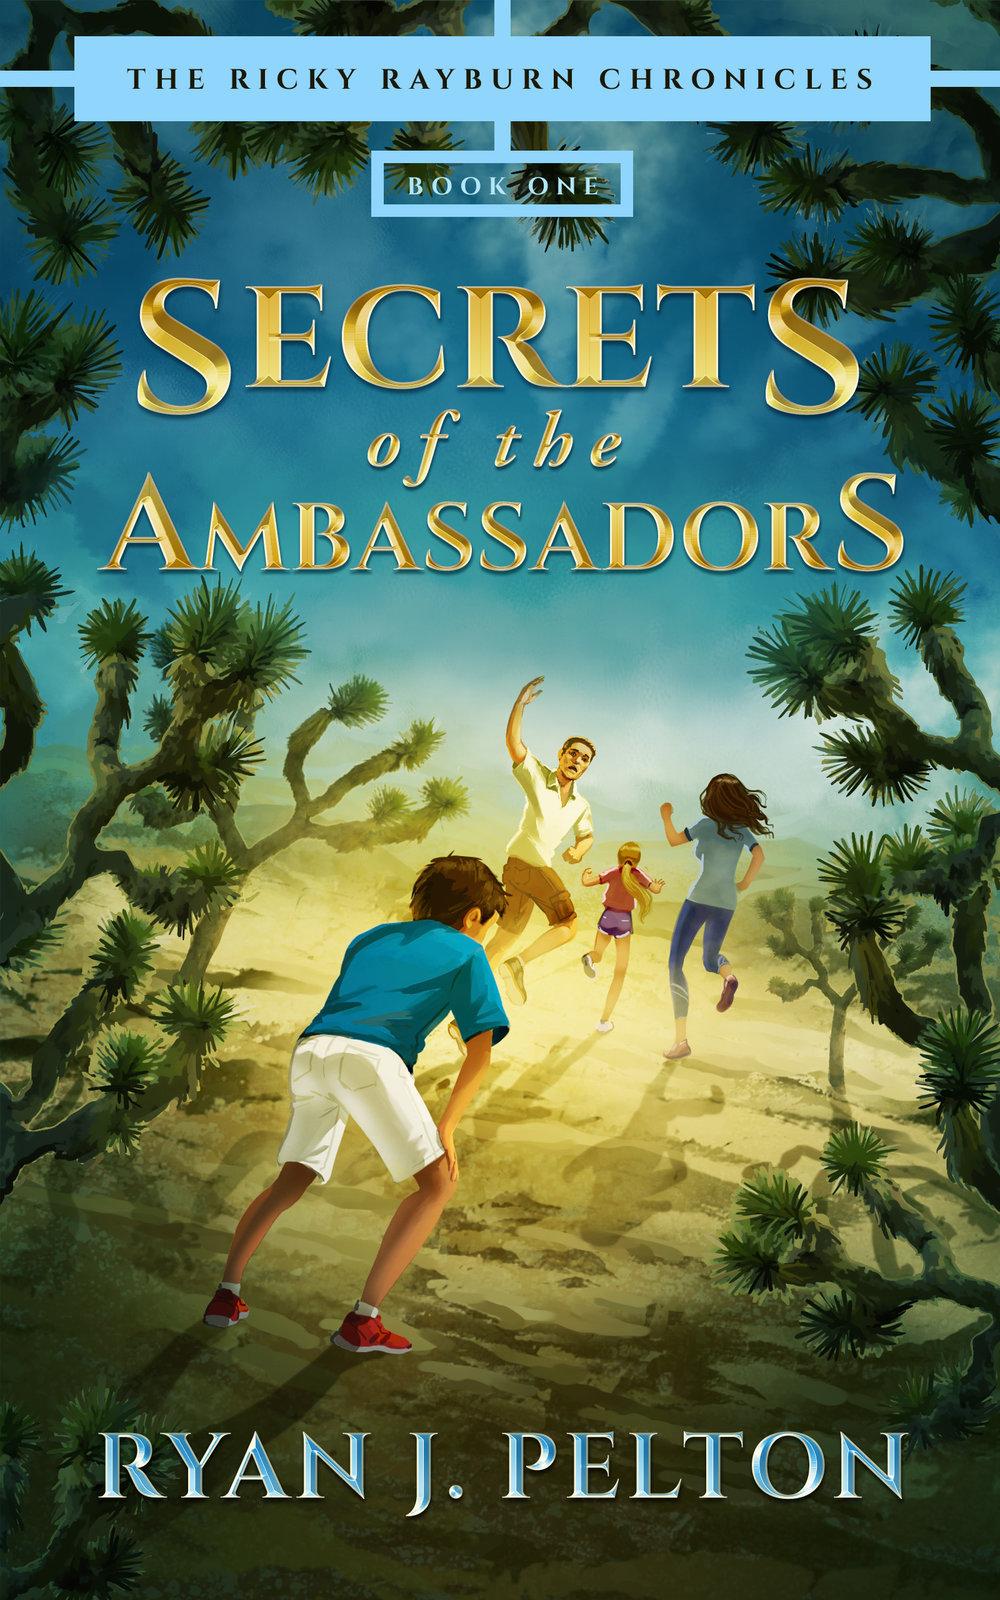 Secret of the Ambassadors 002.jpg